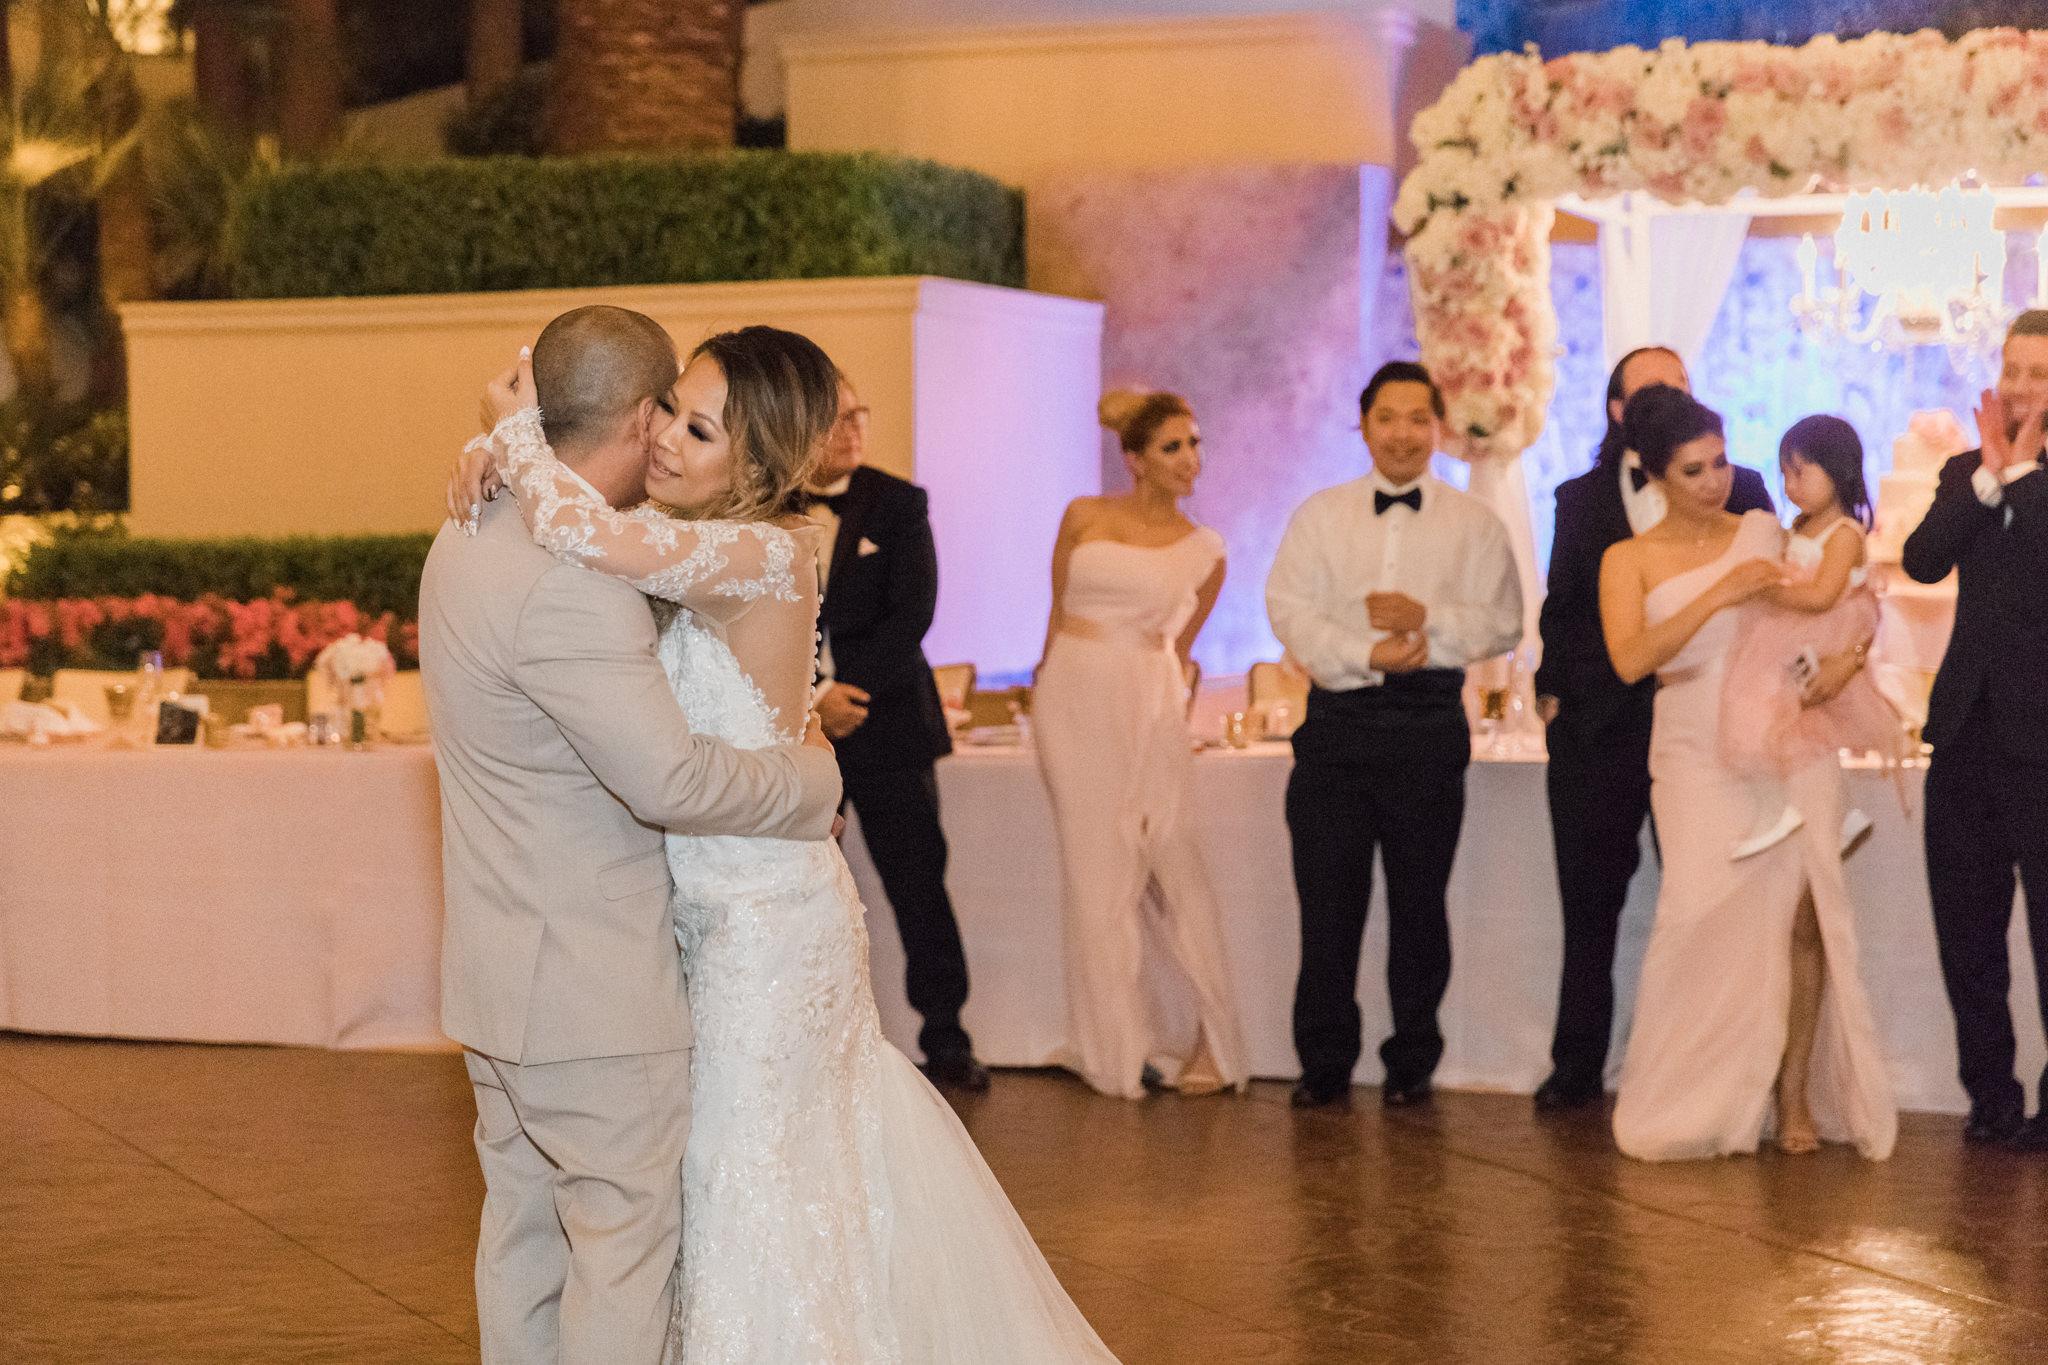 #weddingplannerlasvegas,#lasvegasweddingcoordinators,#weddingcoordinatorslasvegas,#weddingcoordinatorlasvegas,#lasvegasweddingplanner #desirableeventsbydesi #Tropicanawedding #wedding, #love, #lovewins, #samesexwedding, #gaywedding, #tropicana, #lasvegaswedding, #weddinglasvegas, #weddingplannerslasvegas, #lasvegasweddingplanners, # layersoflovely, #lasvegaswedding, #susieandwill, #rusticwedding, #wedding, #historic5thstreetschool, #downtownlasvegas, #fourseasons, #fourseasonslasvegas #fourseasonsweddings, #lasvegasweddings,